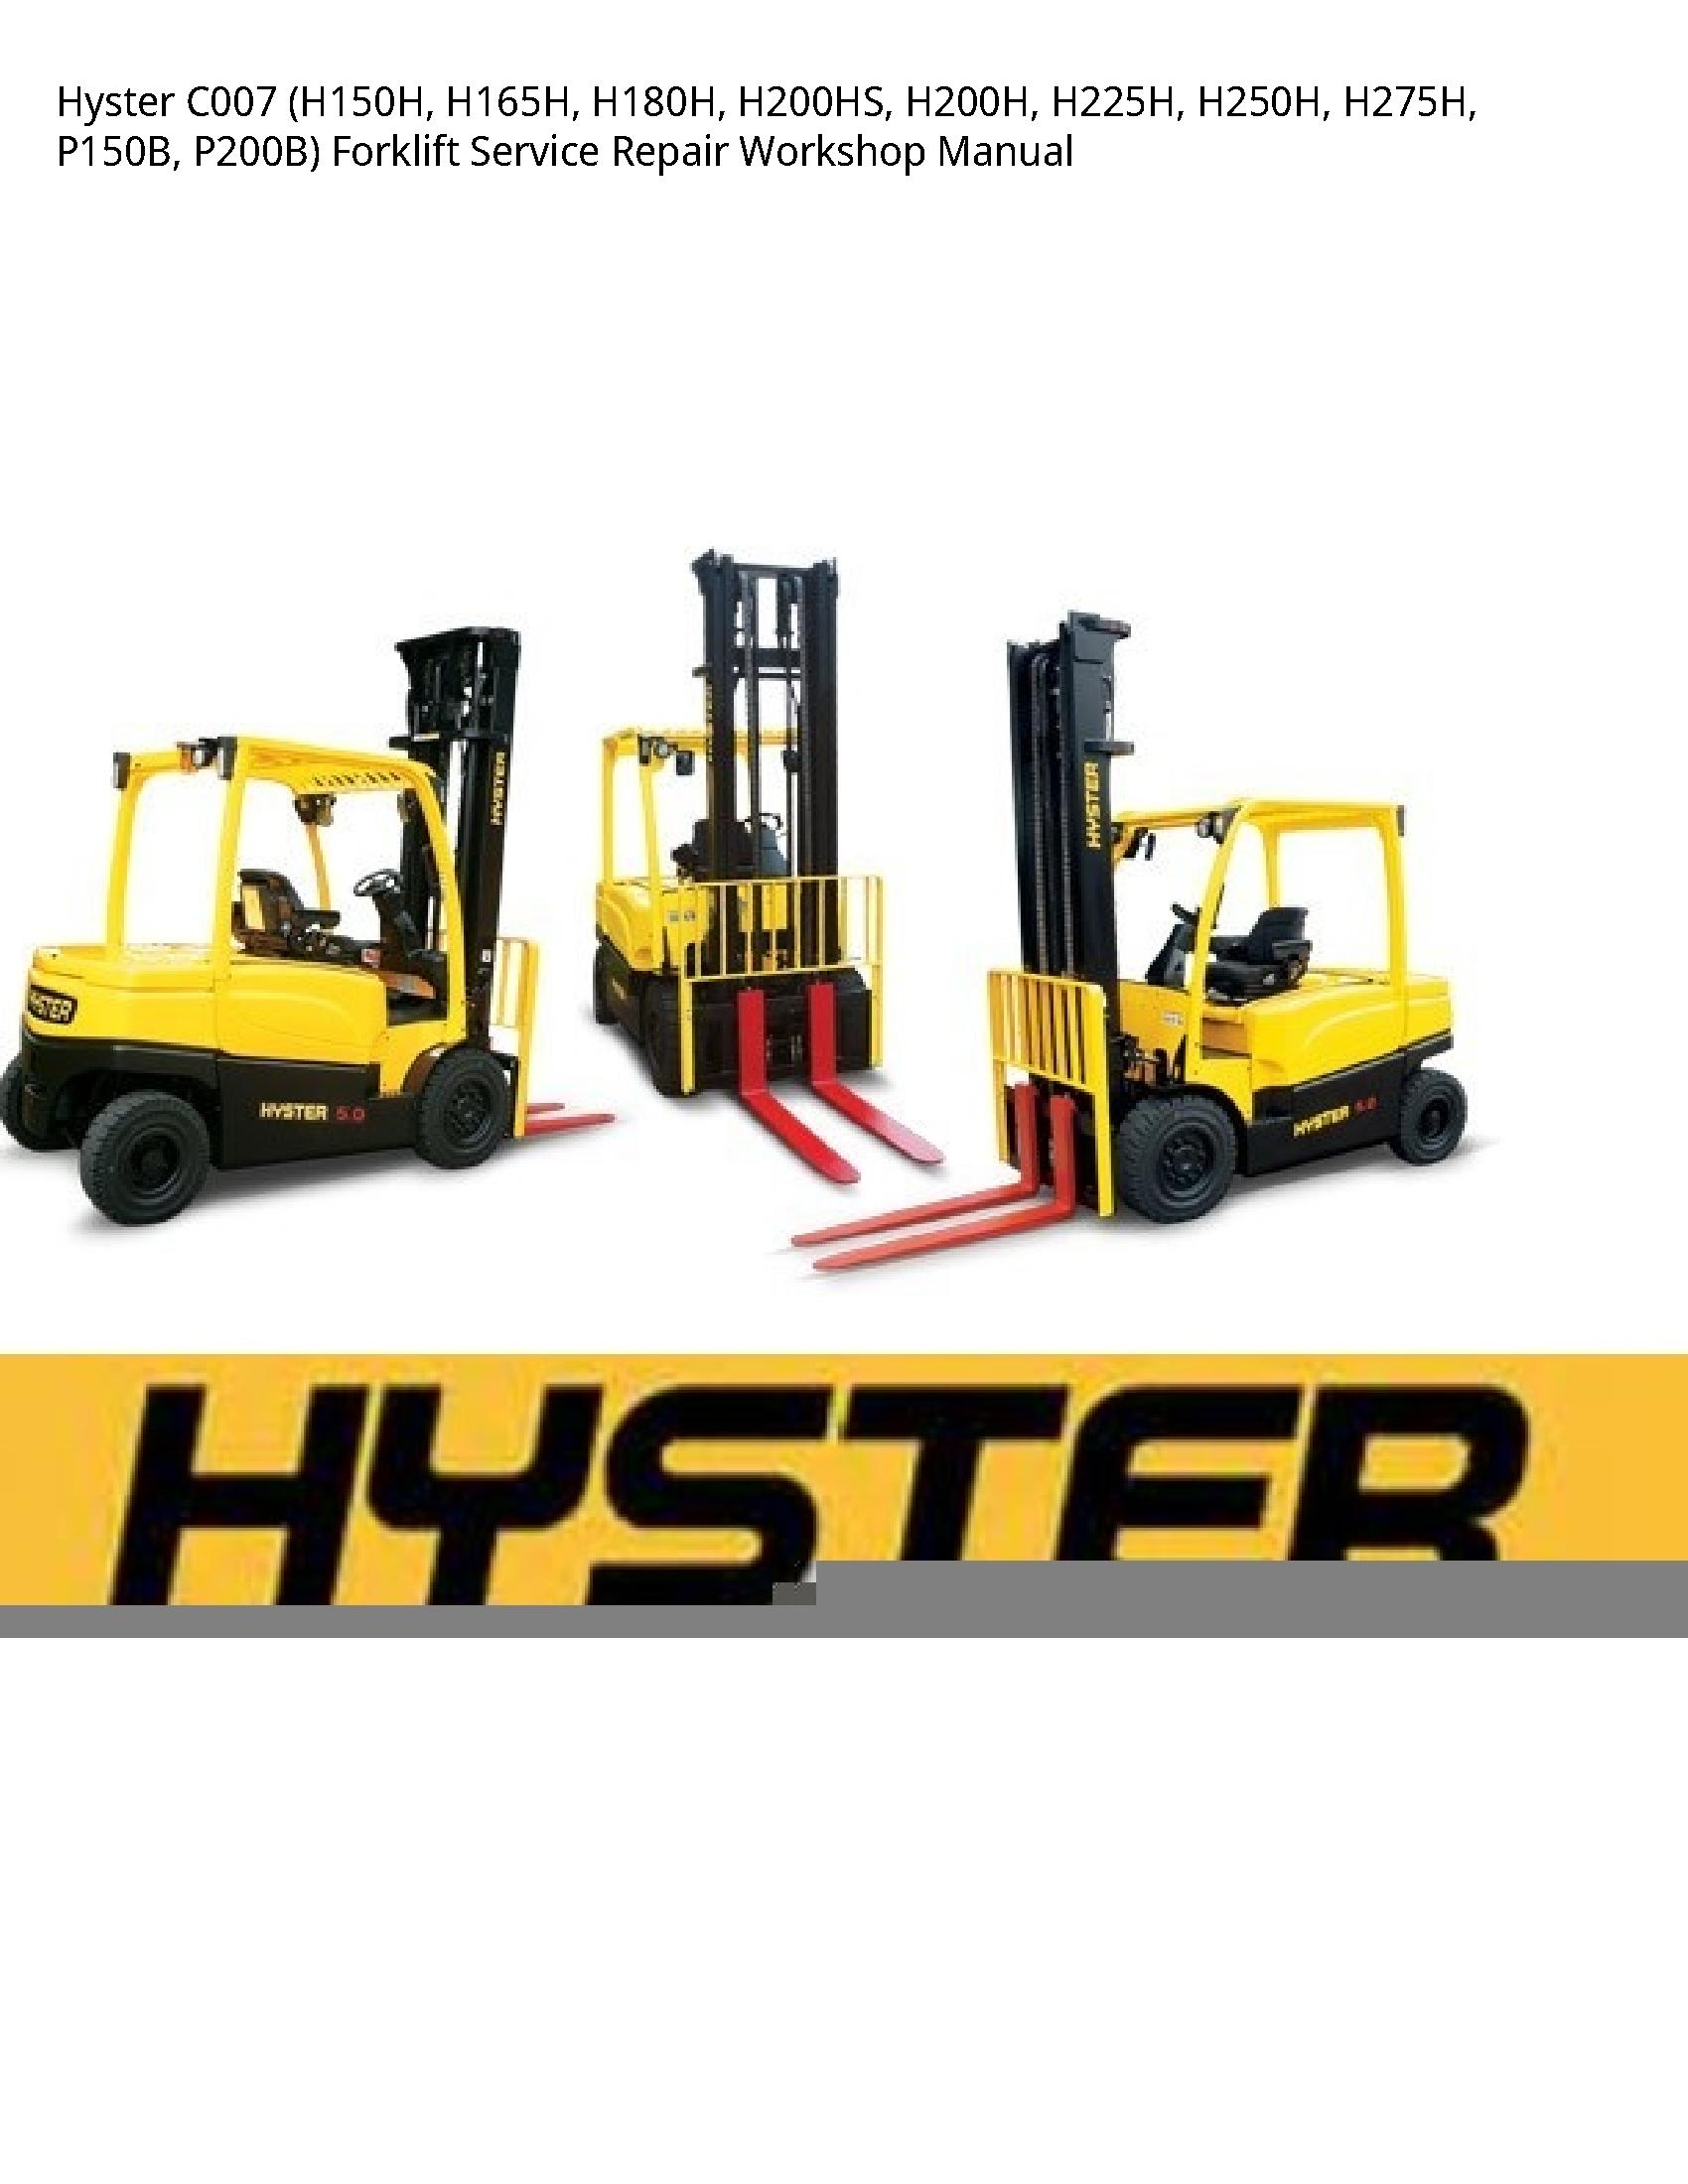 Hyster C007 Forklift manual